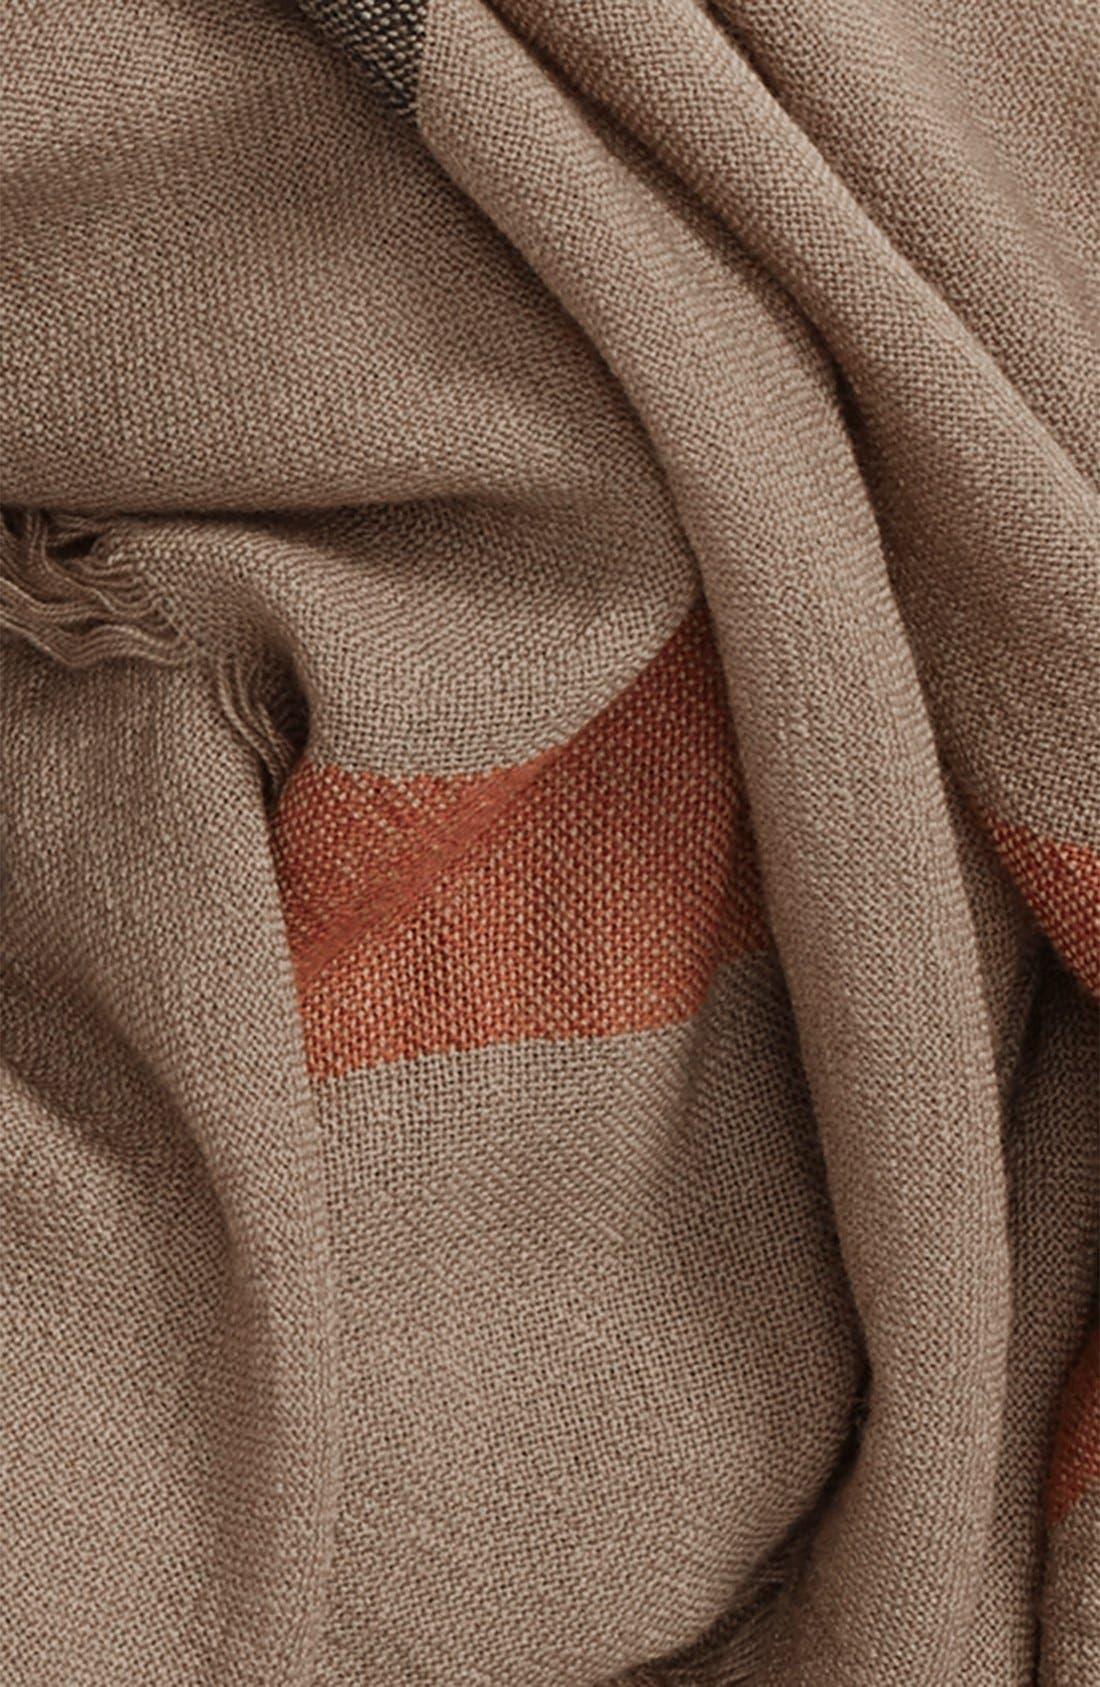 Alternate Image 3  - Burberry Check Merino Wool Scarf